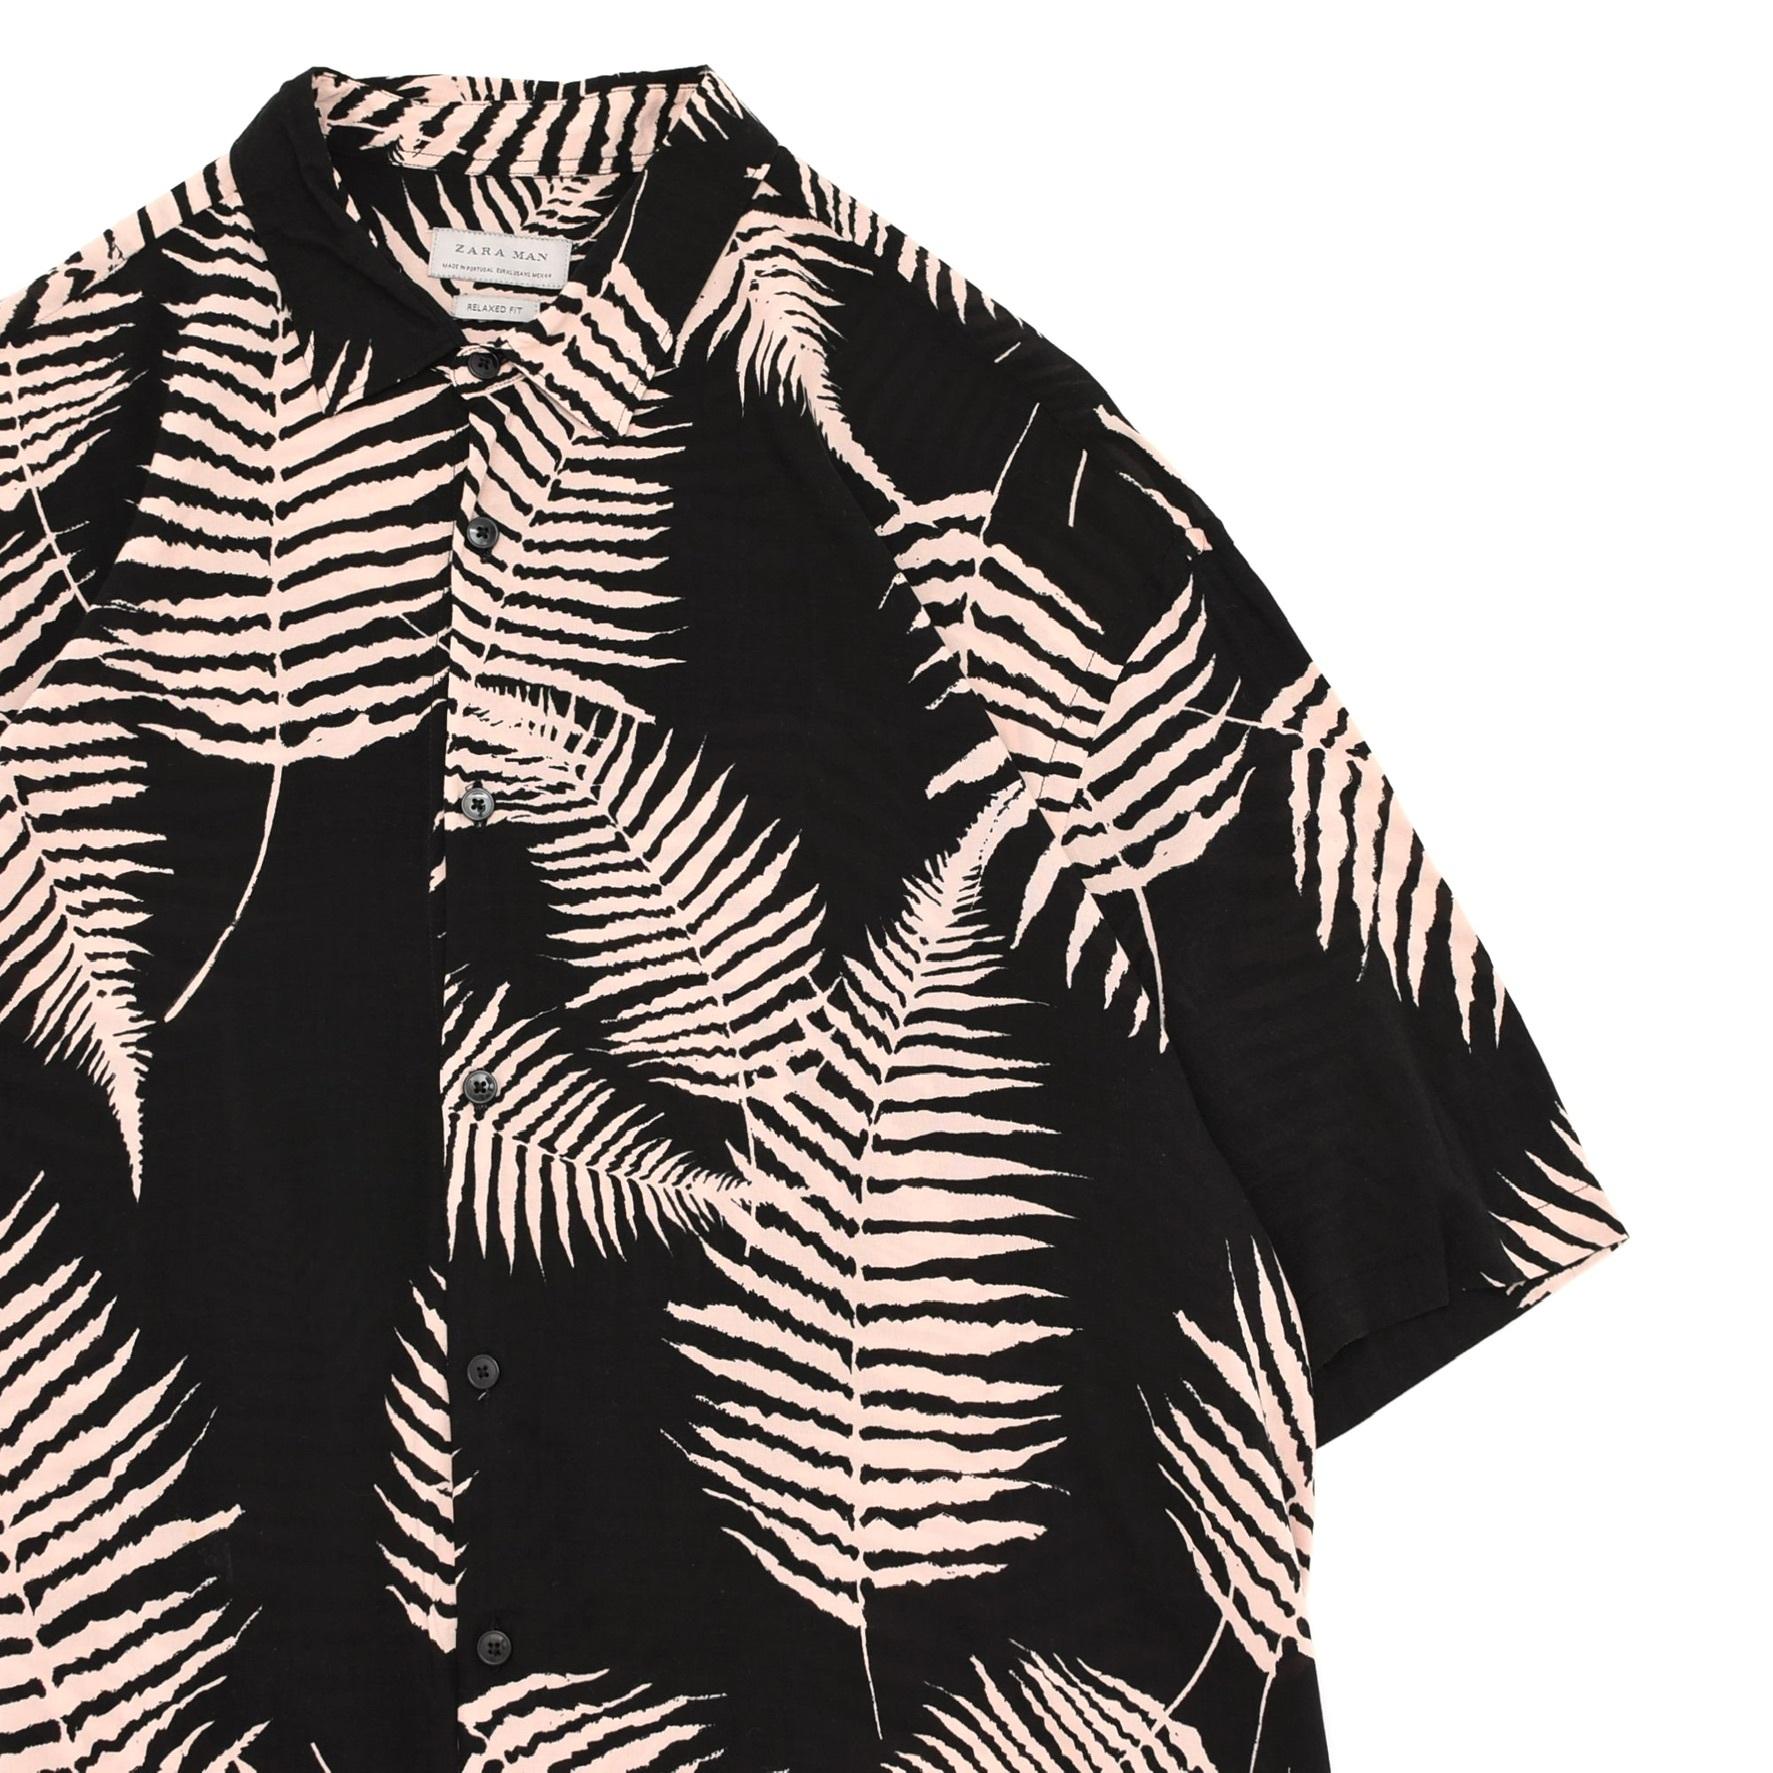 ZARA MAN leaf full pattern rayon shirt